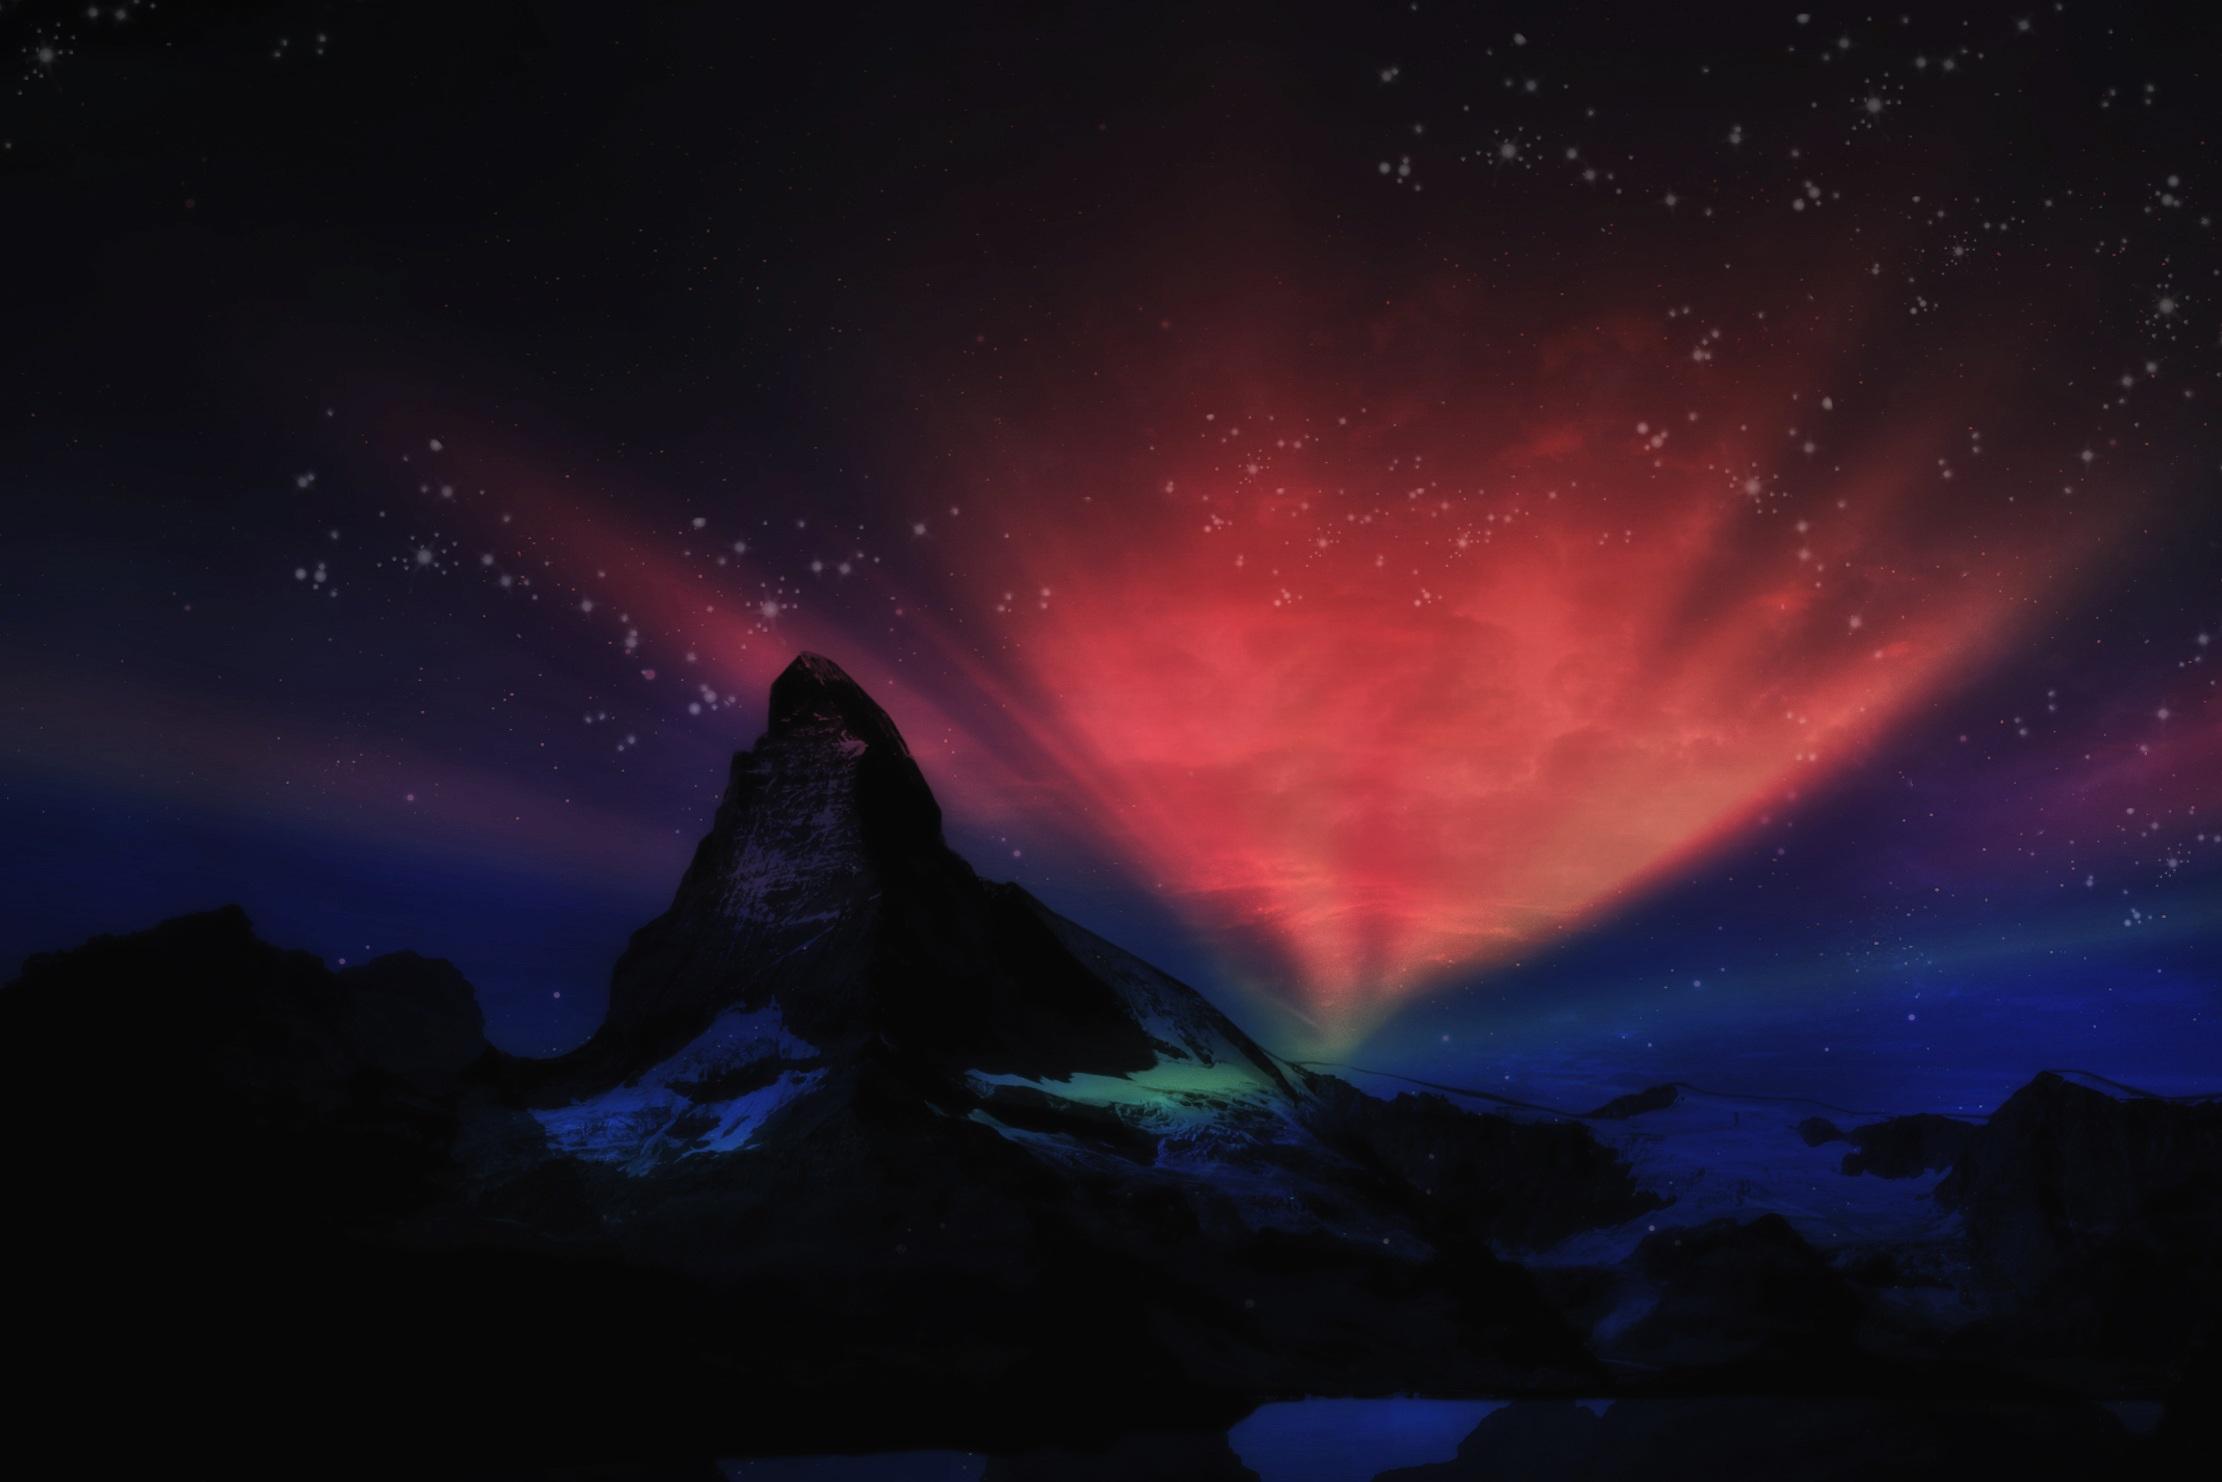 Mountain Wallpaper Hd Aurora On The Matterhorn Image Free Stock Photo Public